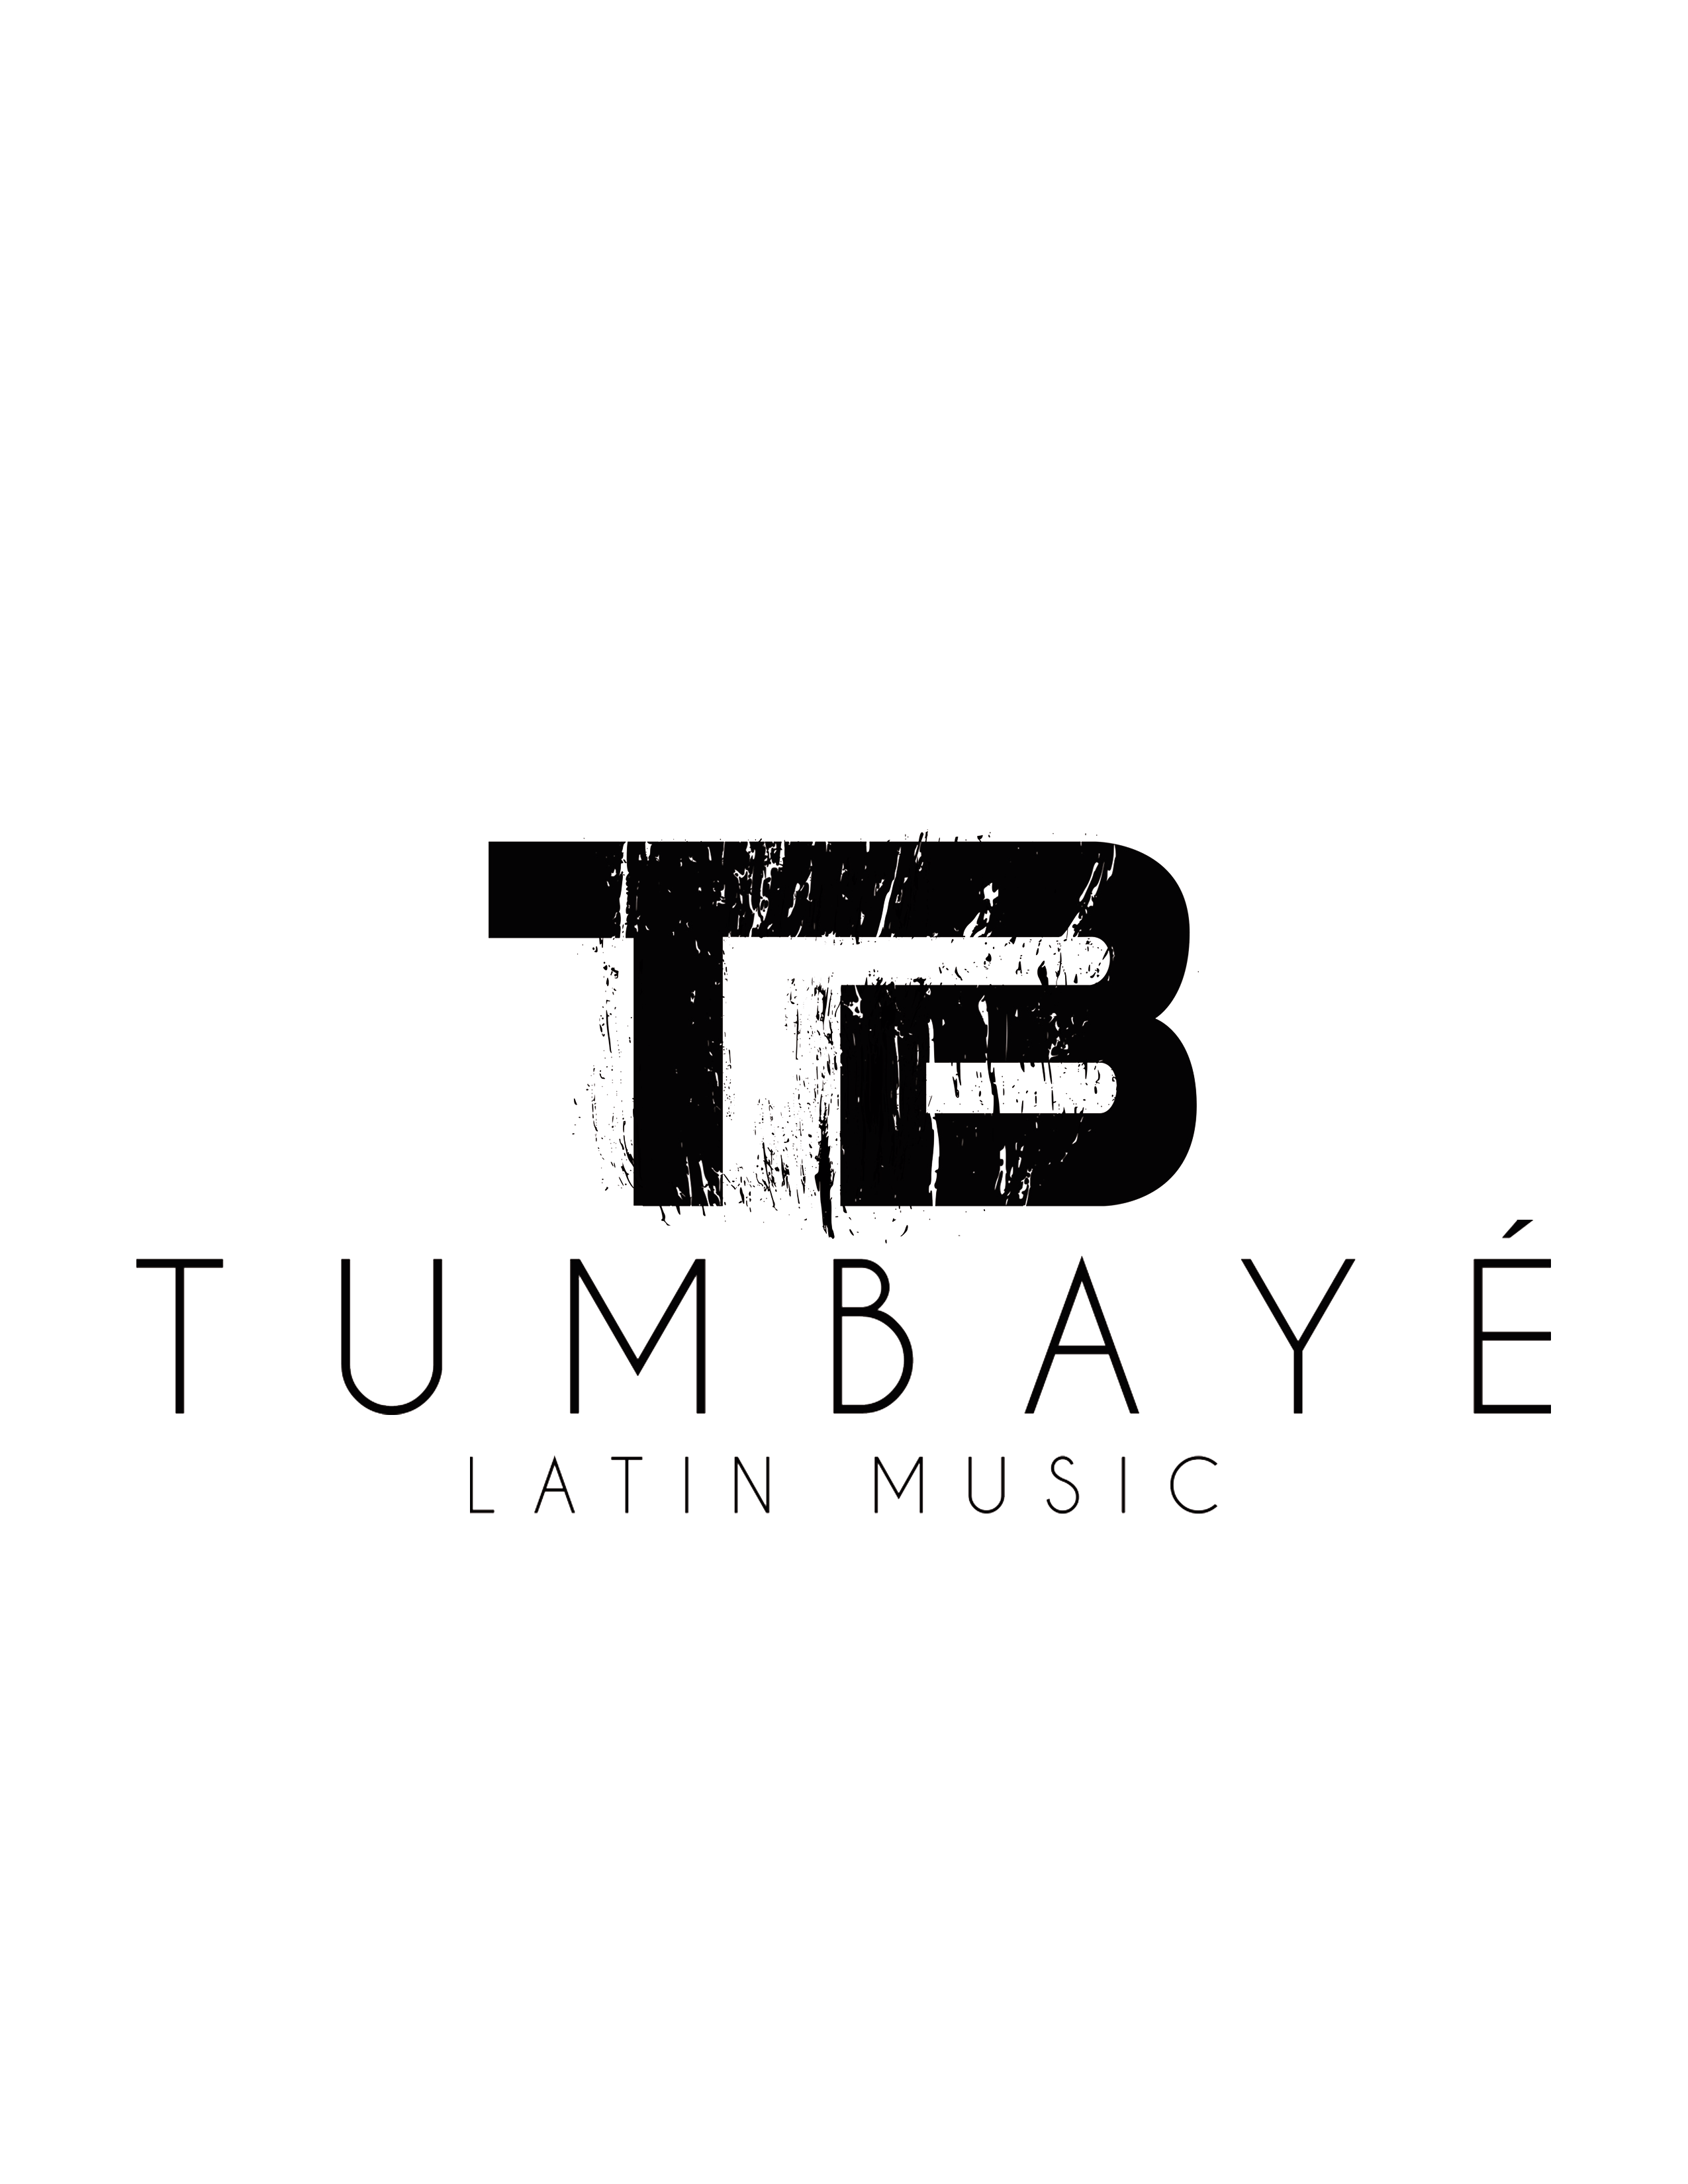 Tumbaye Latin Band